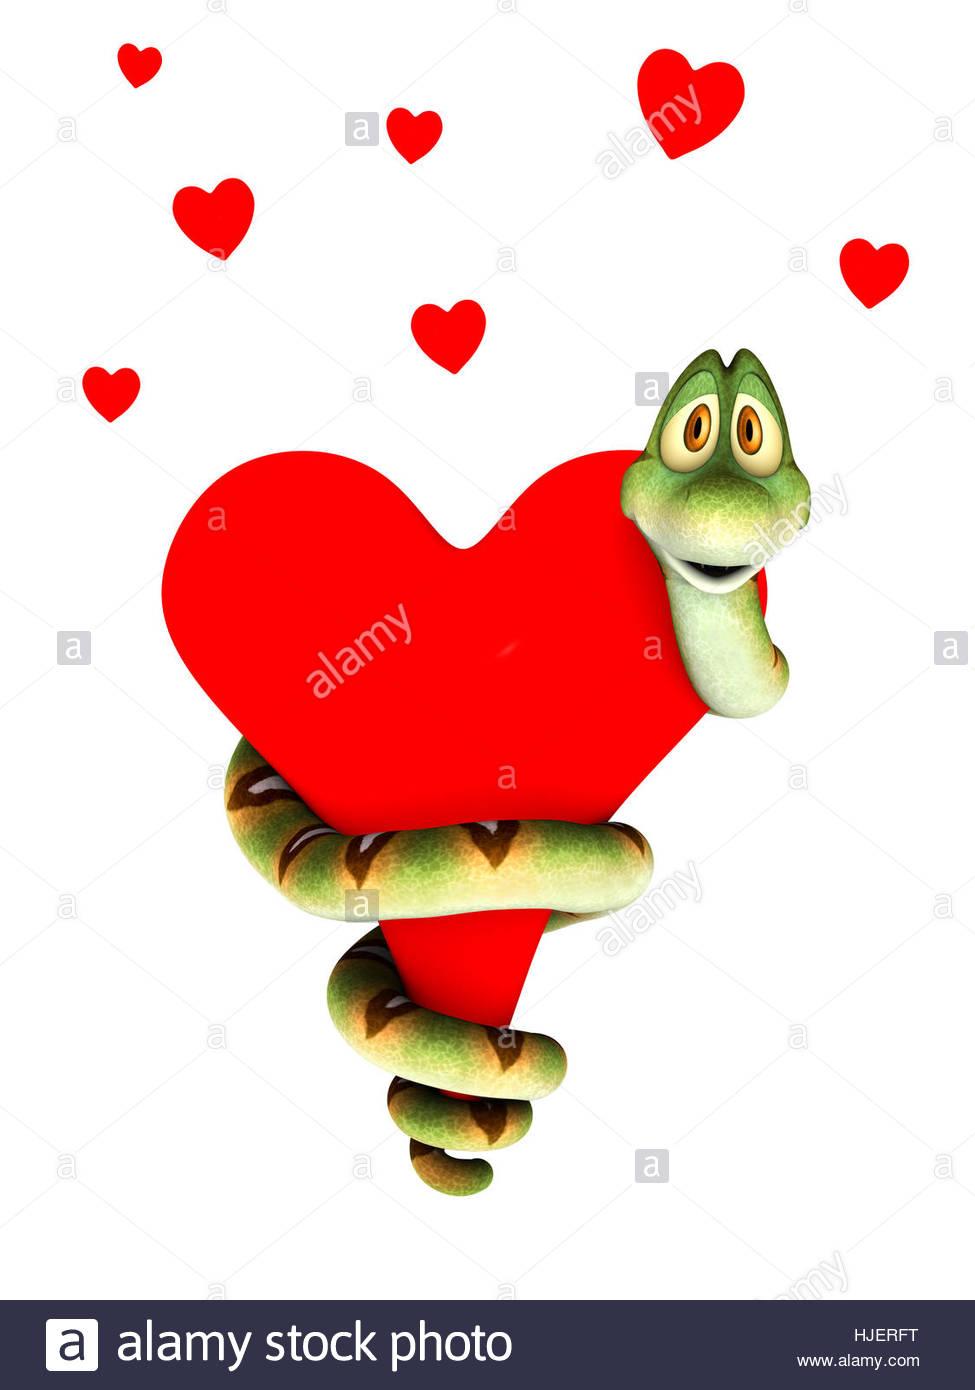 975x1390 A Cute Cartoon Snake Curling Around A Big Red Heart, Cuddling It